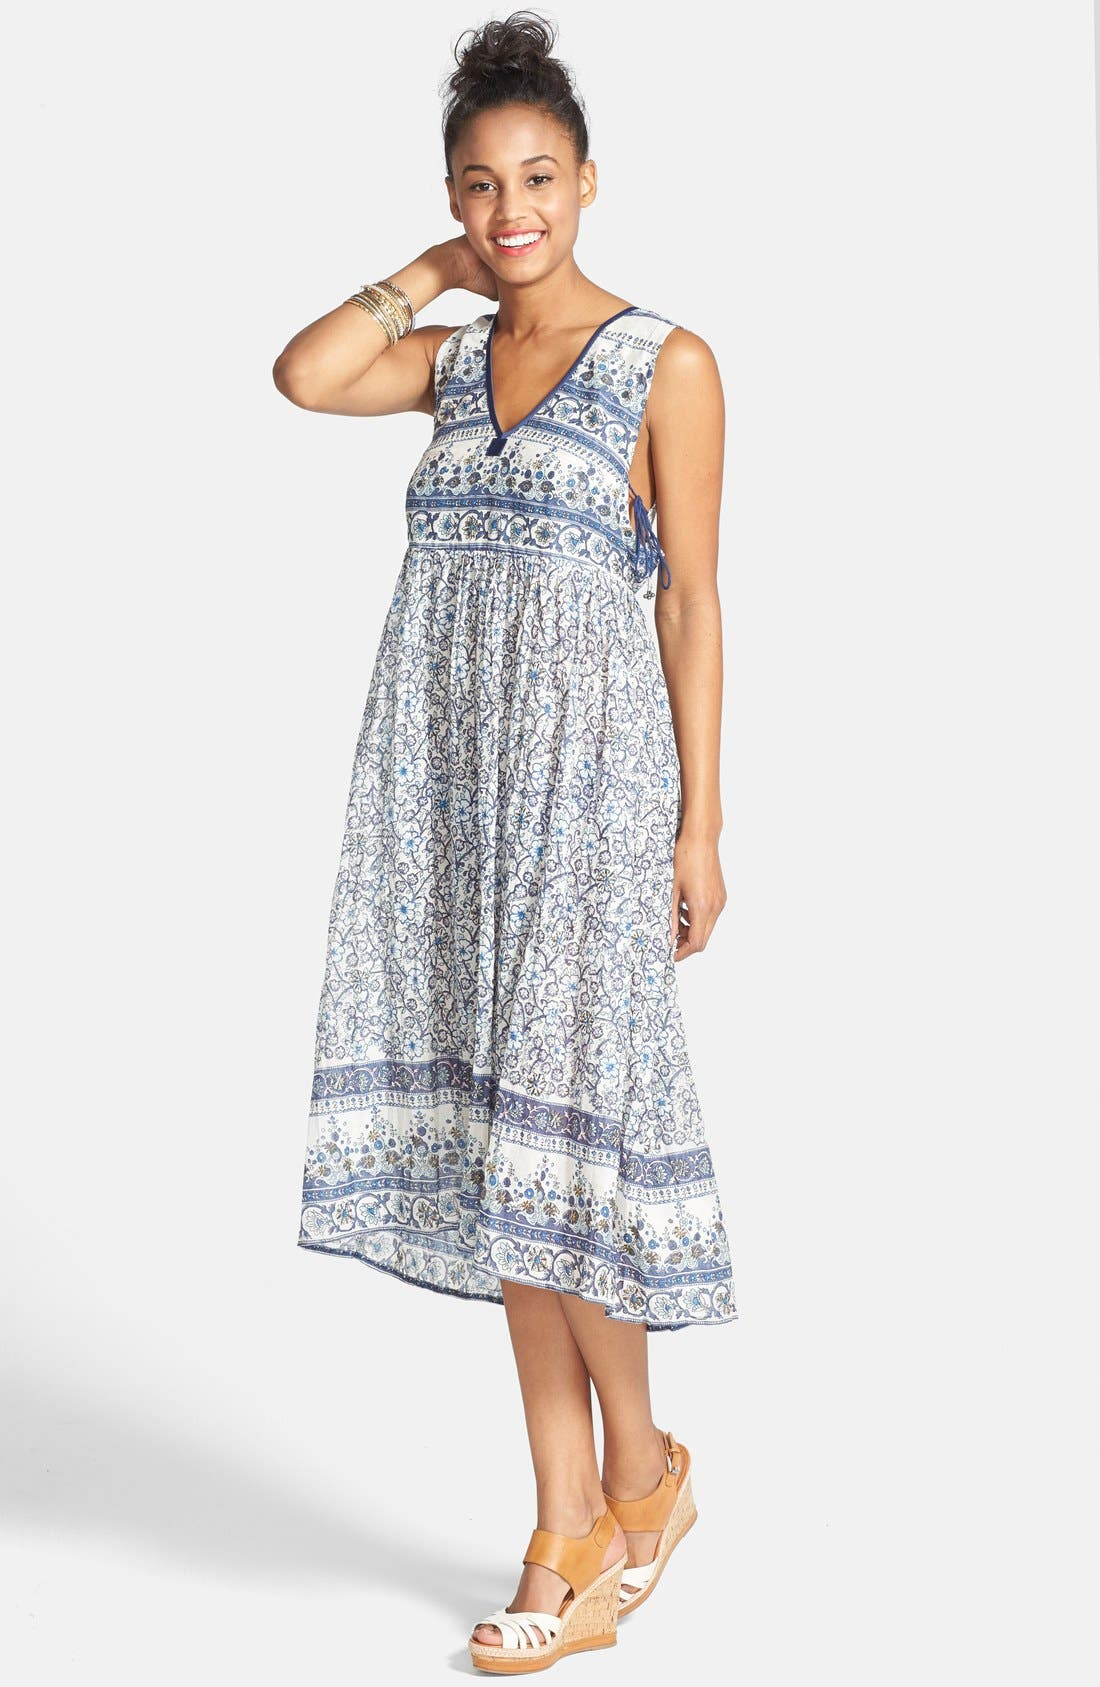 Main Image - Billabong 'I Heart This' Floral Print Midi Dress (Juniors)